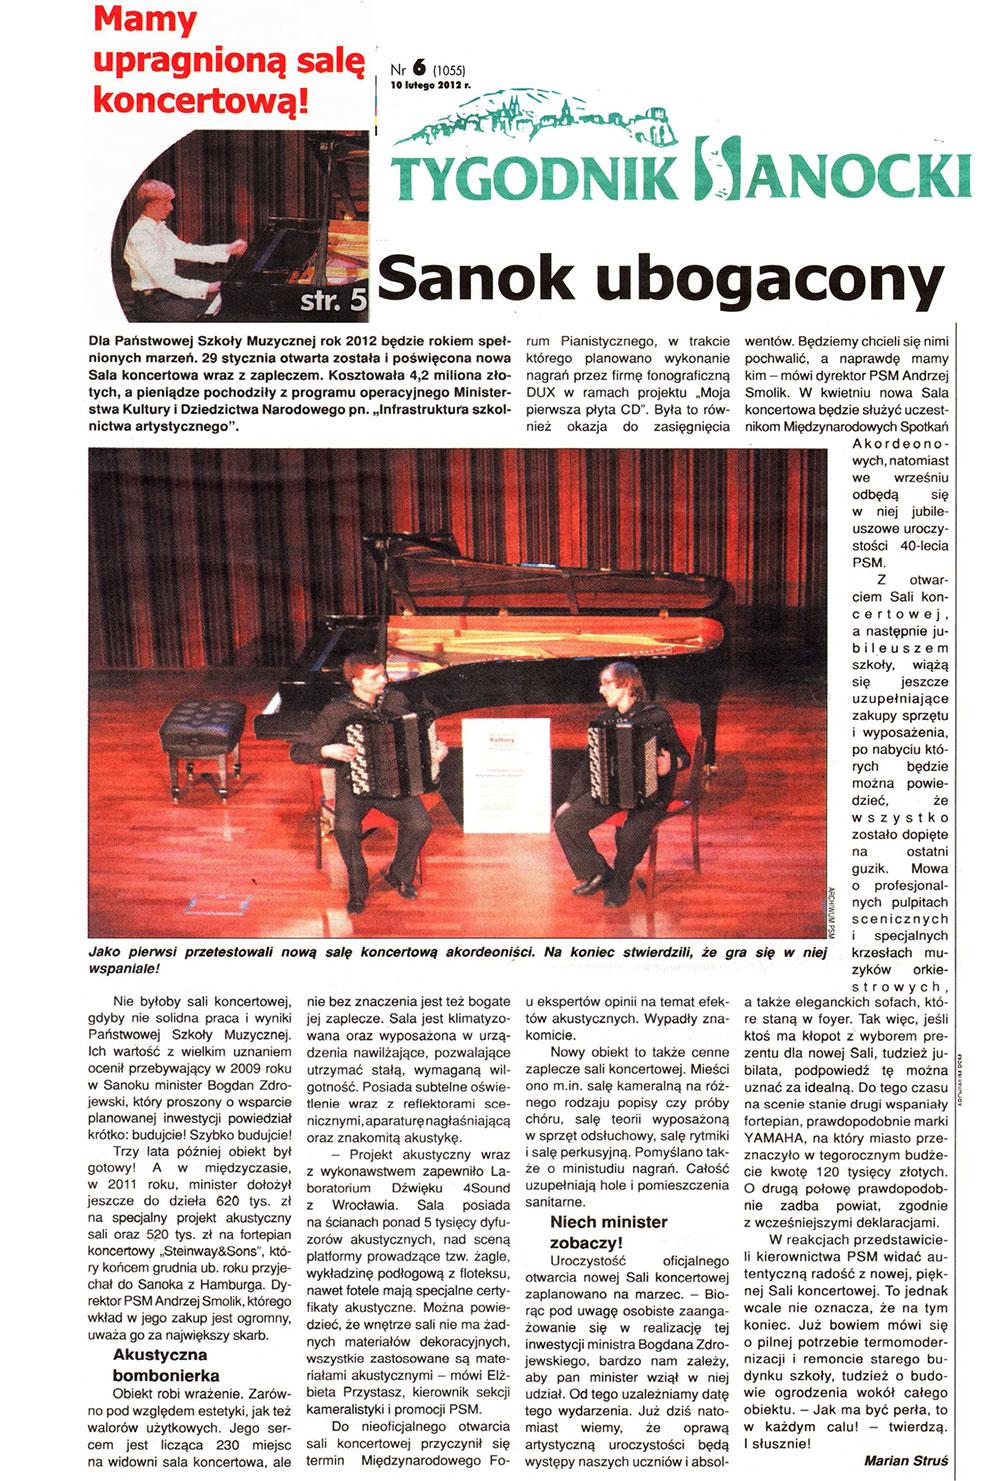 Prasa-Sanok-ubogacony